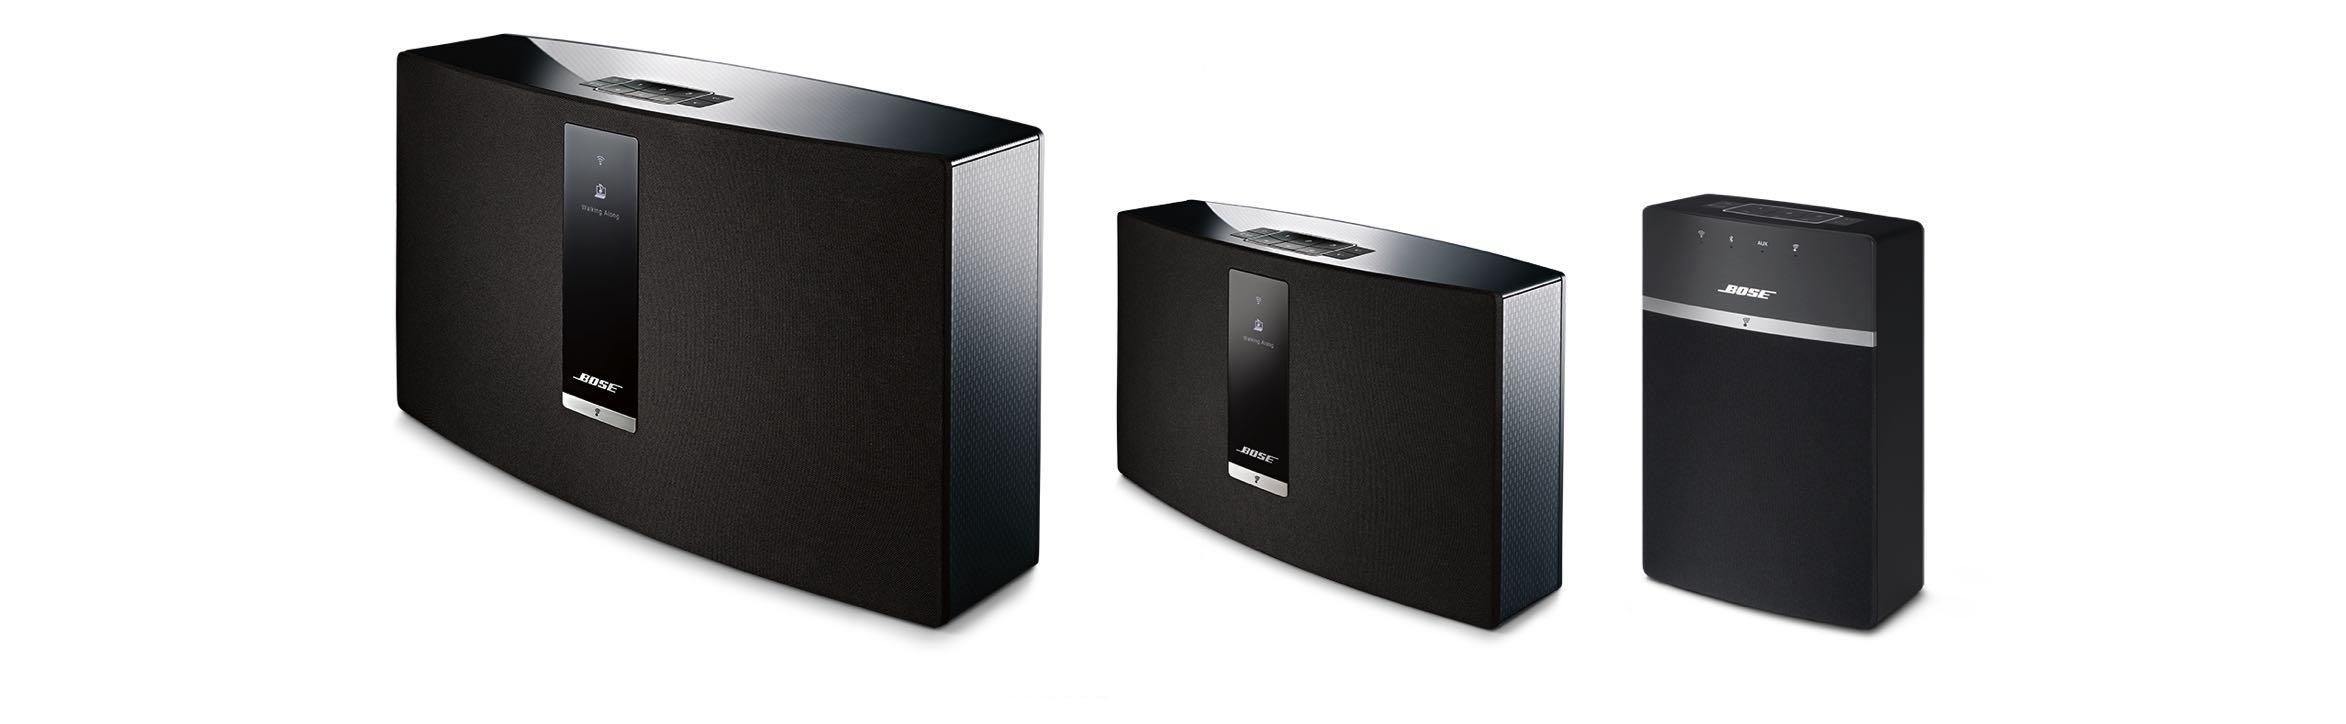 Bose soundtouch multiroom speakers